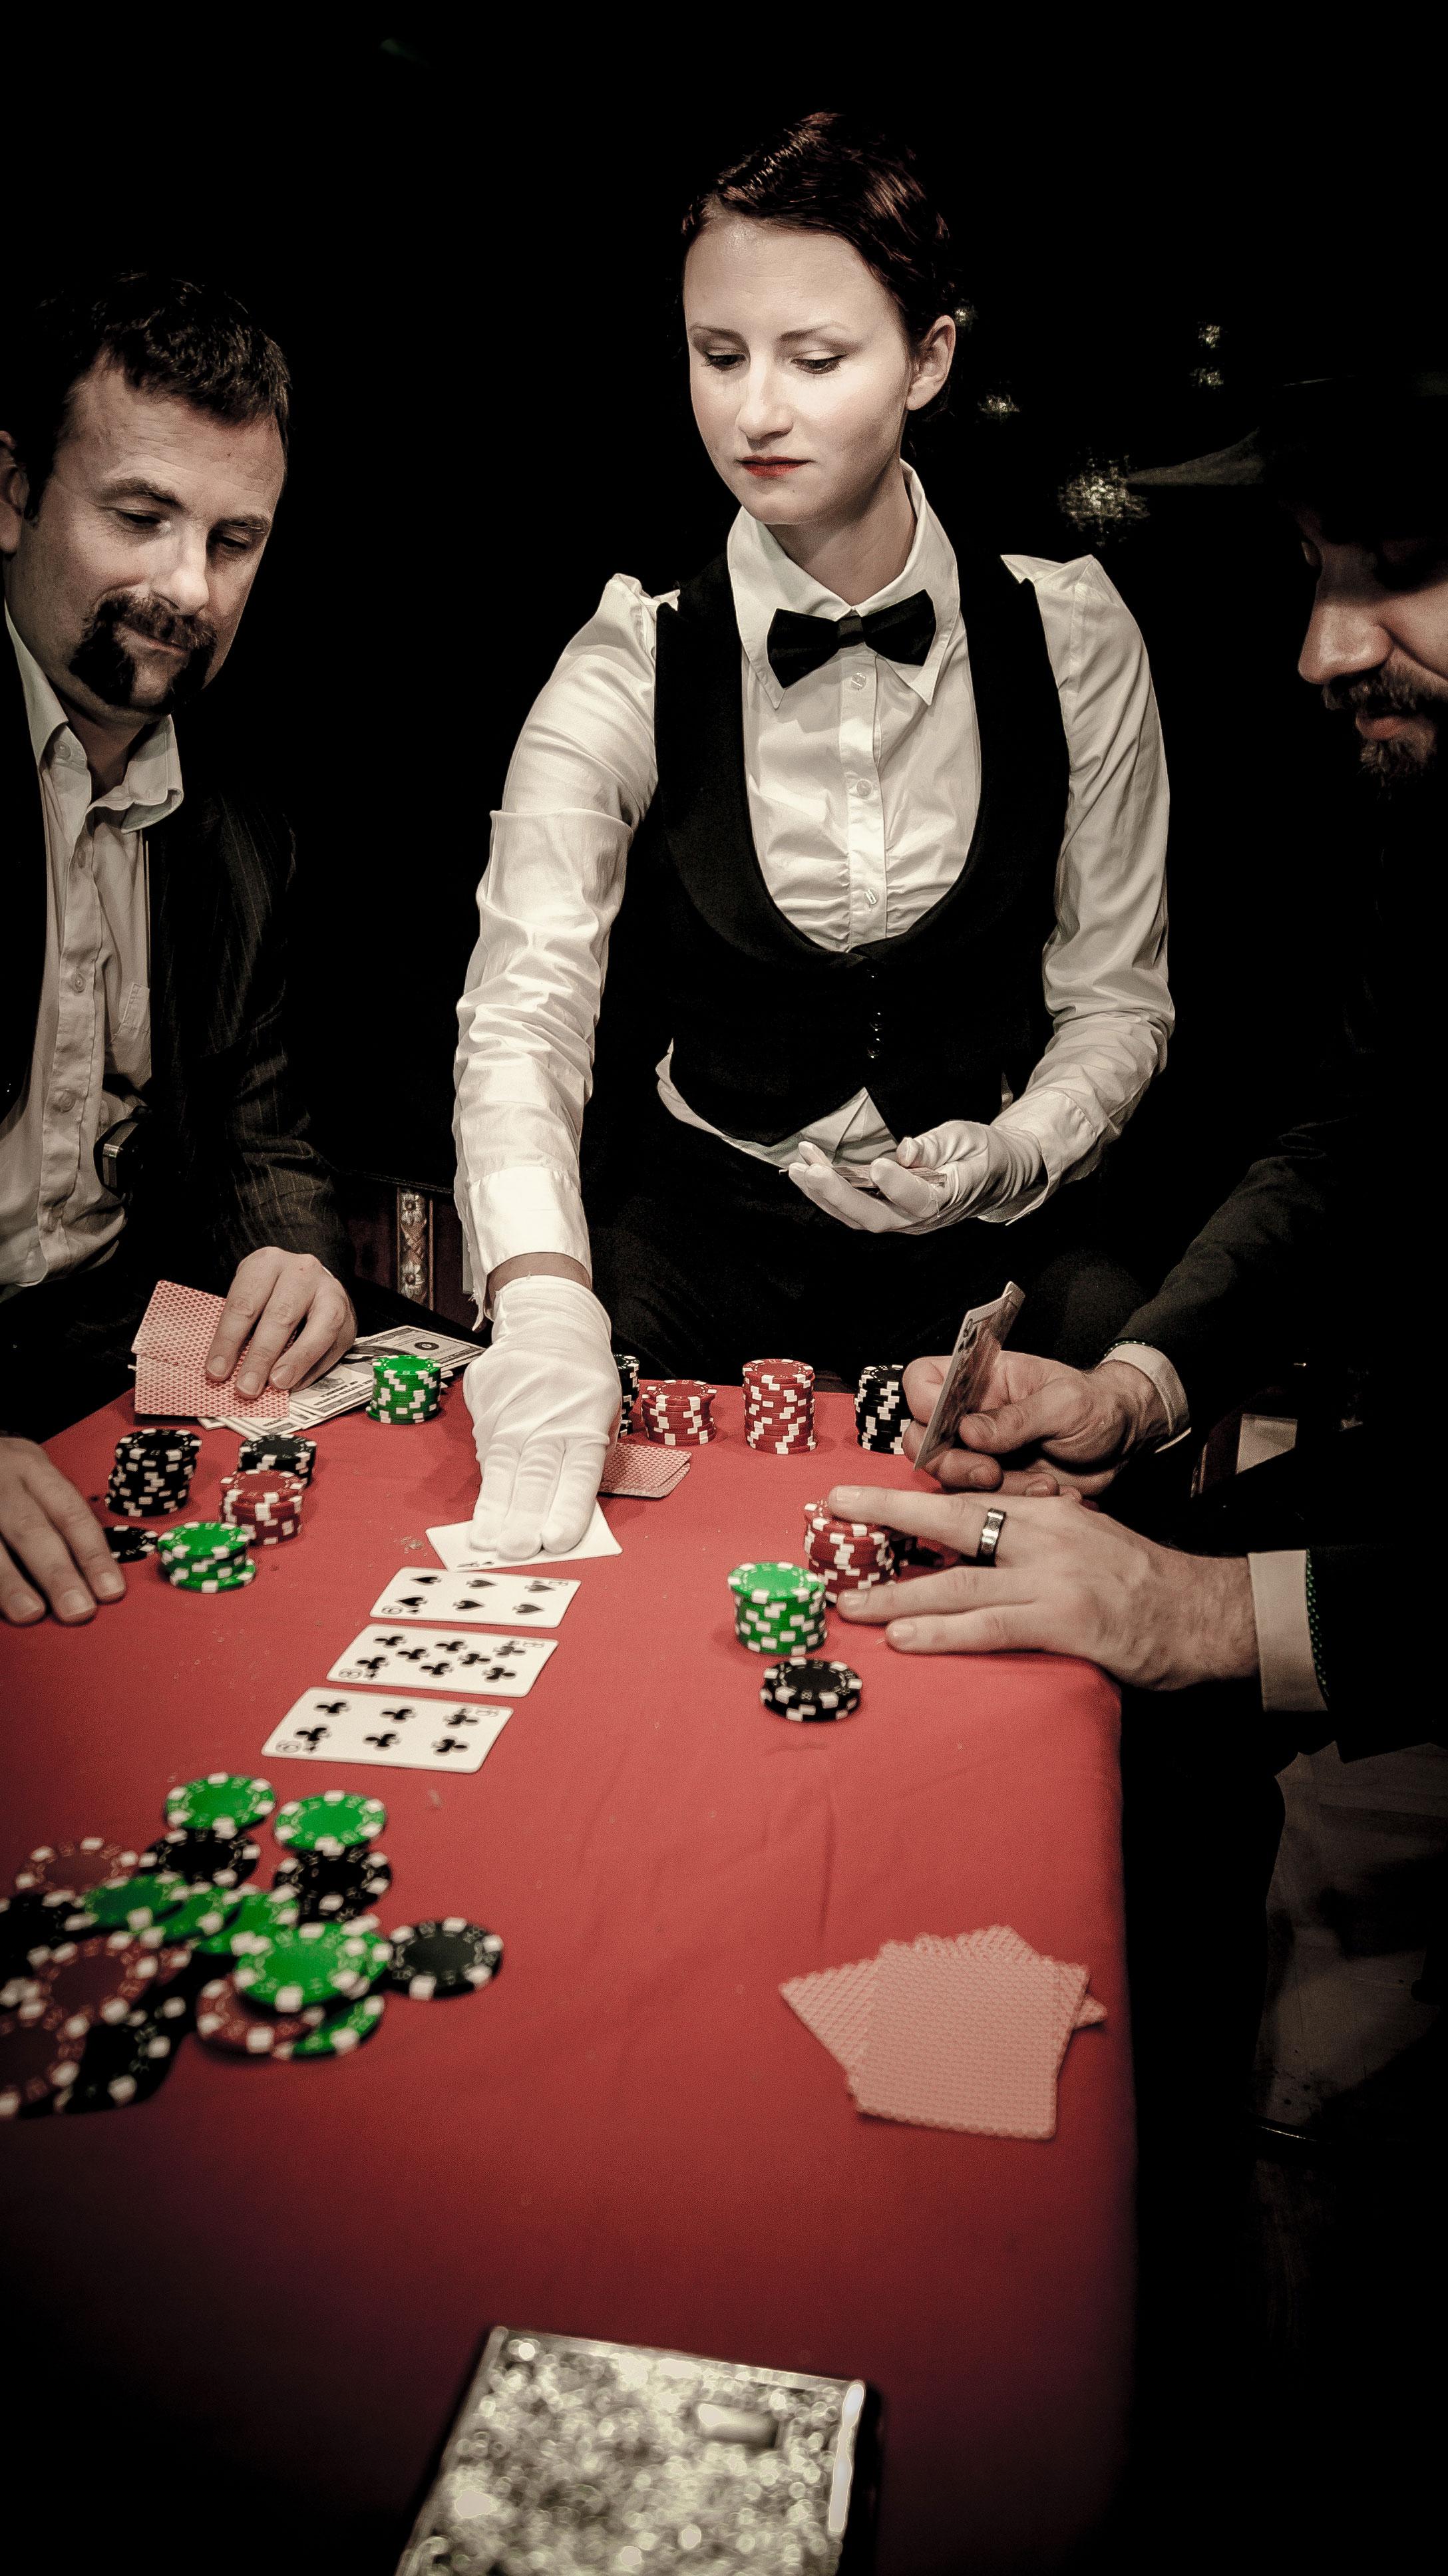 Famiglia Bonifacio: Casino Fortuna Photo:  Tomislav Jeffrey Jemrić